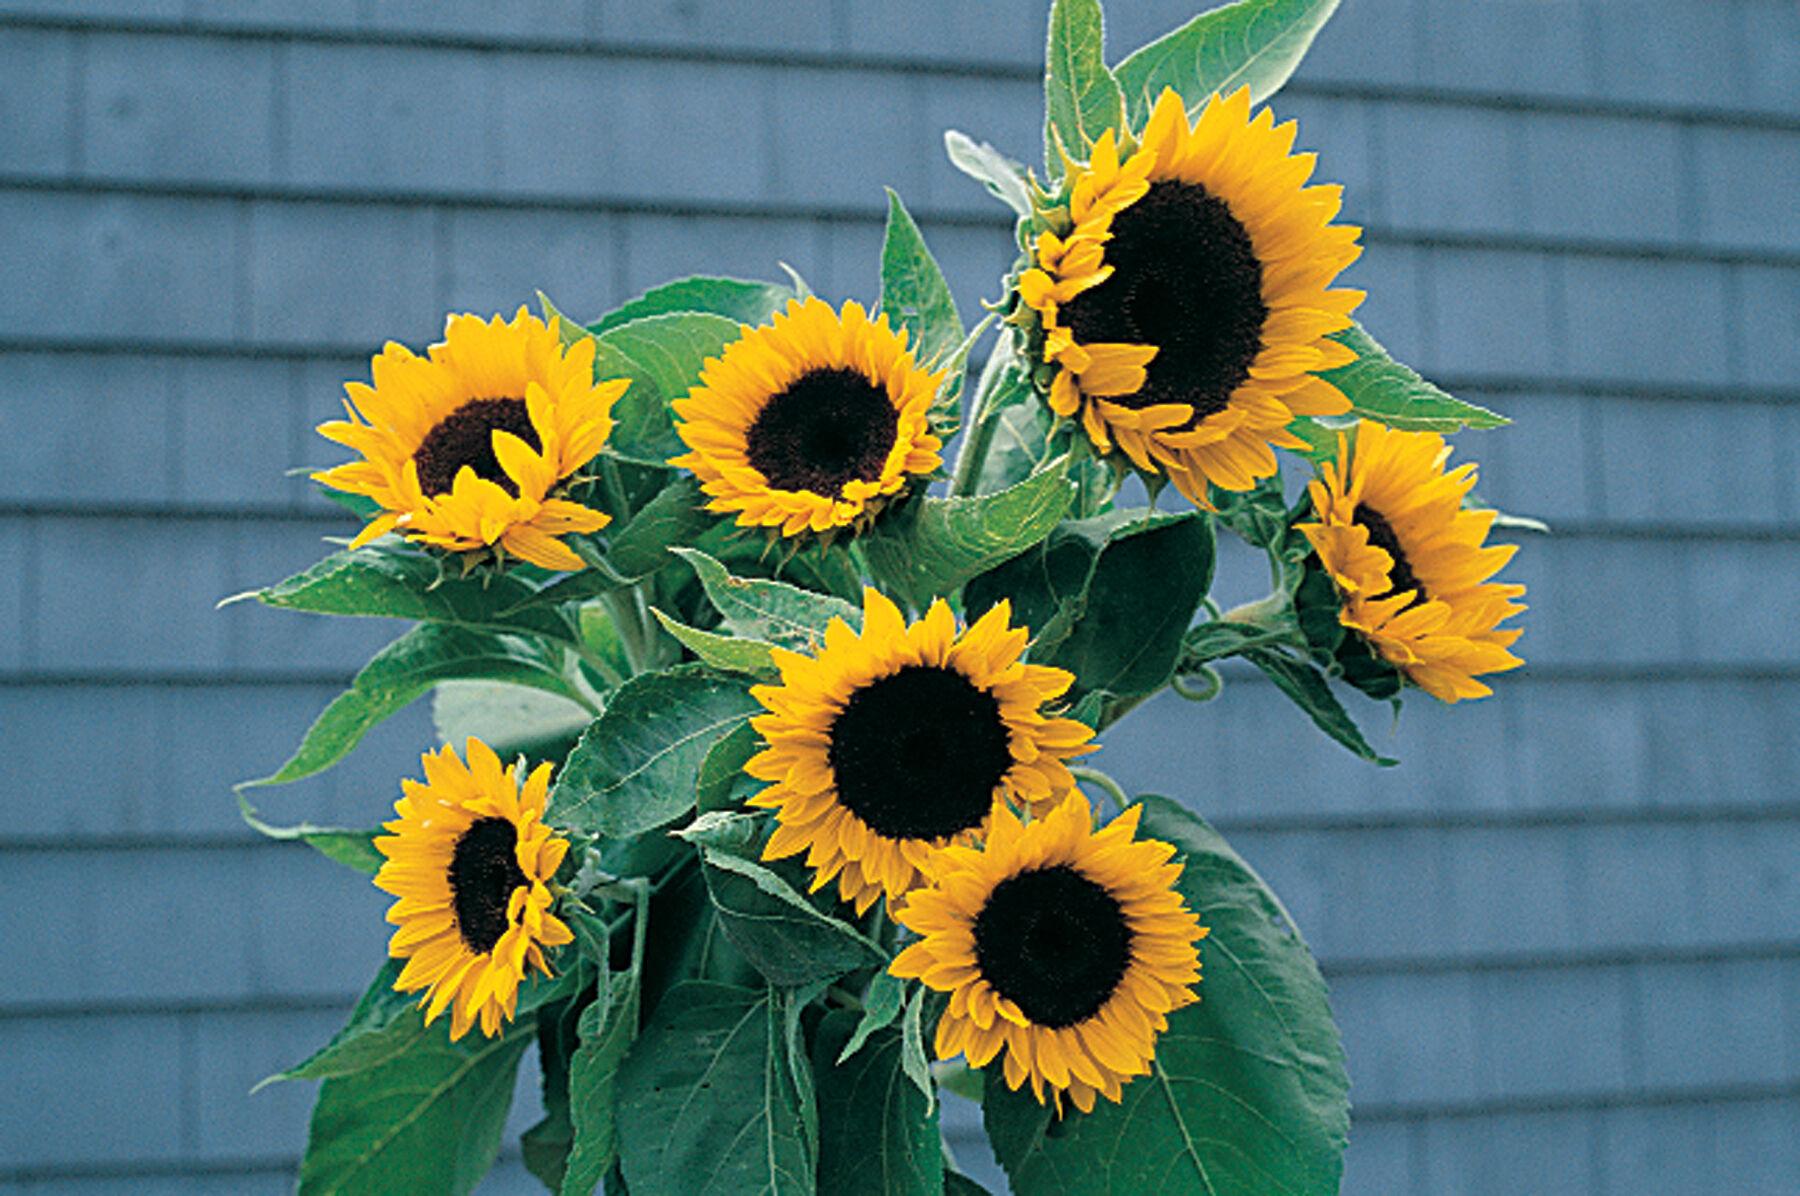 Sunflower days to maturity